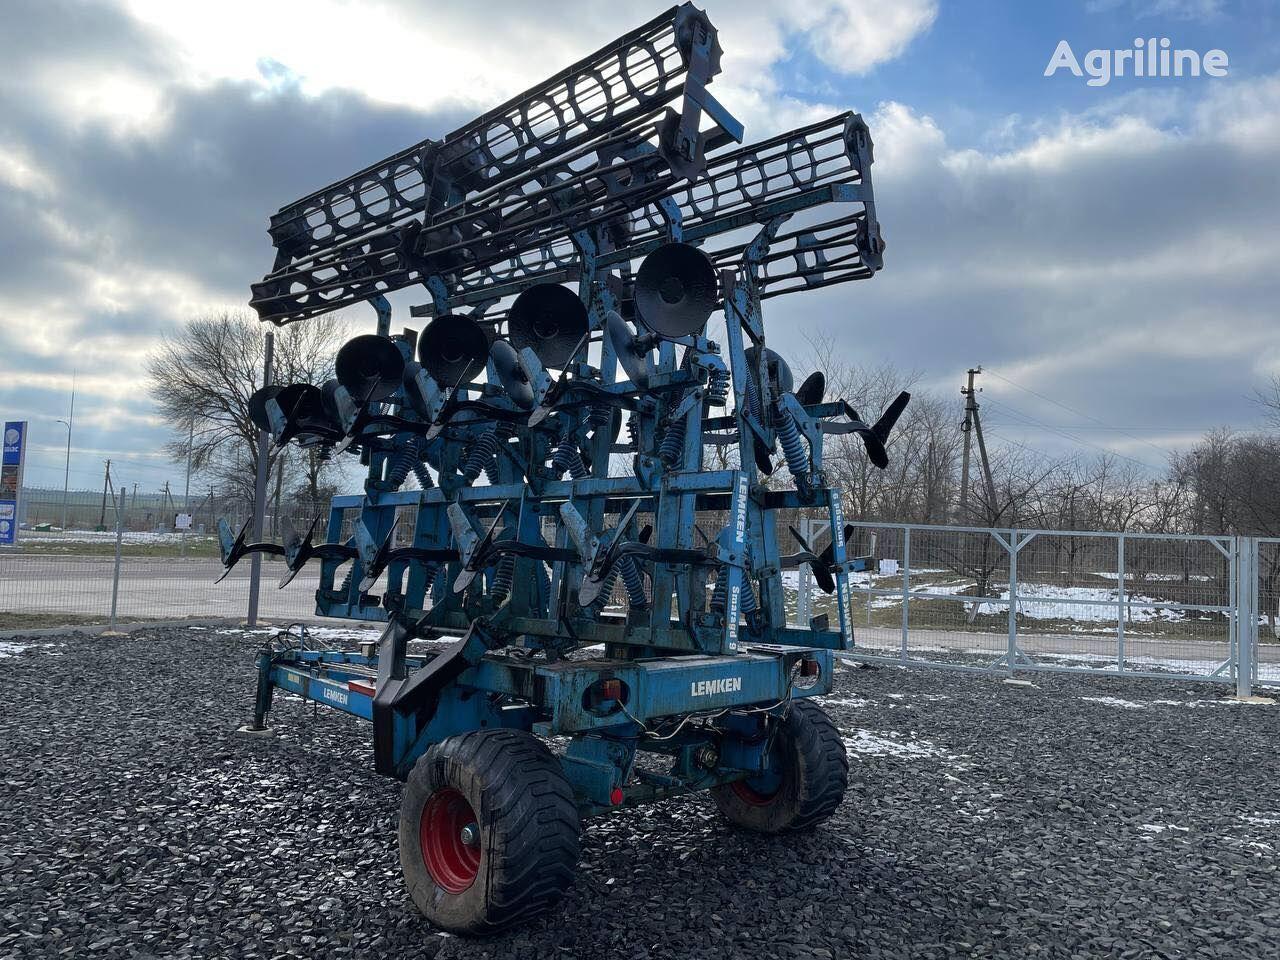 LEMKEN Gigant G 800 cultivator